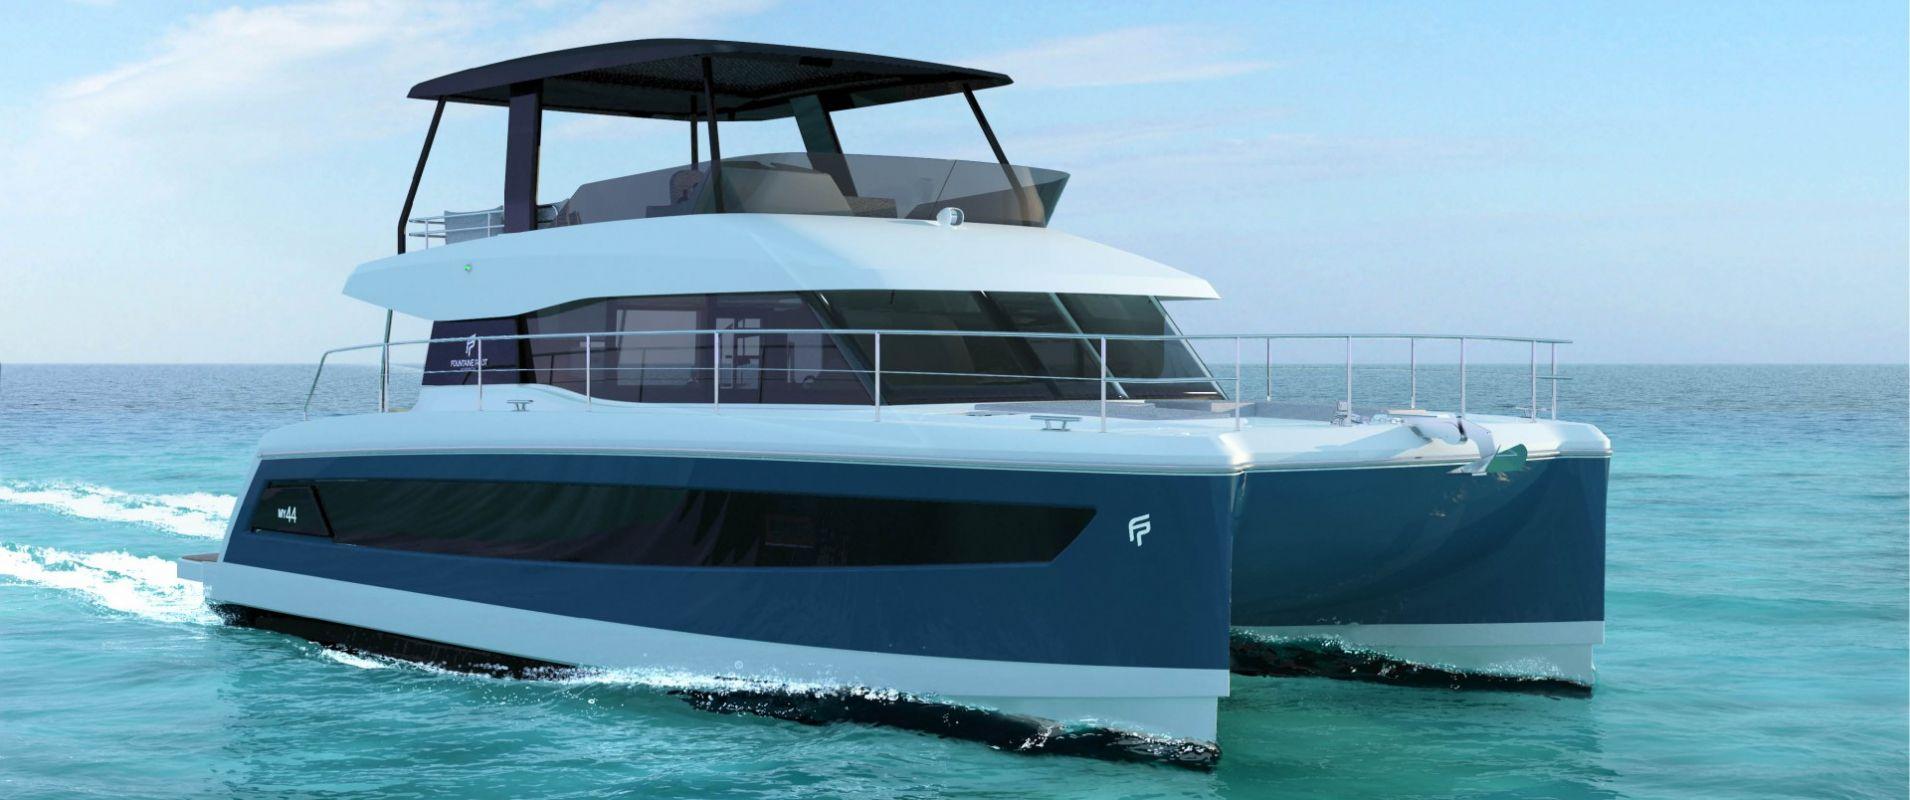 Power catamaran designs - Power Catamaran My 44 Fountaine Pajot